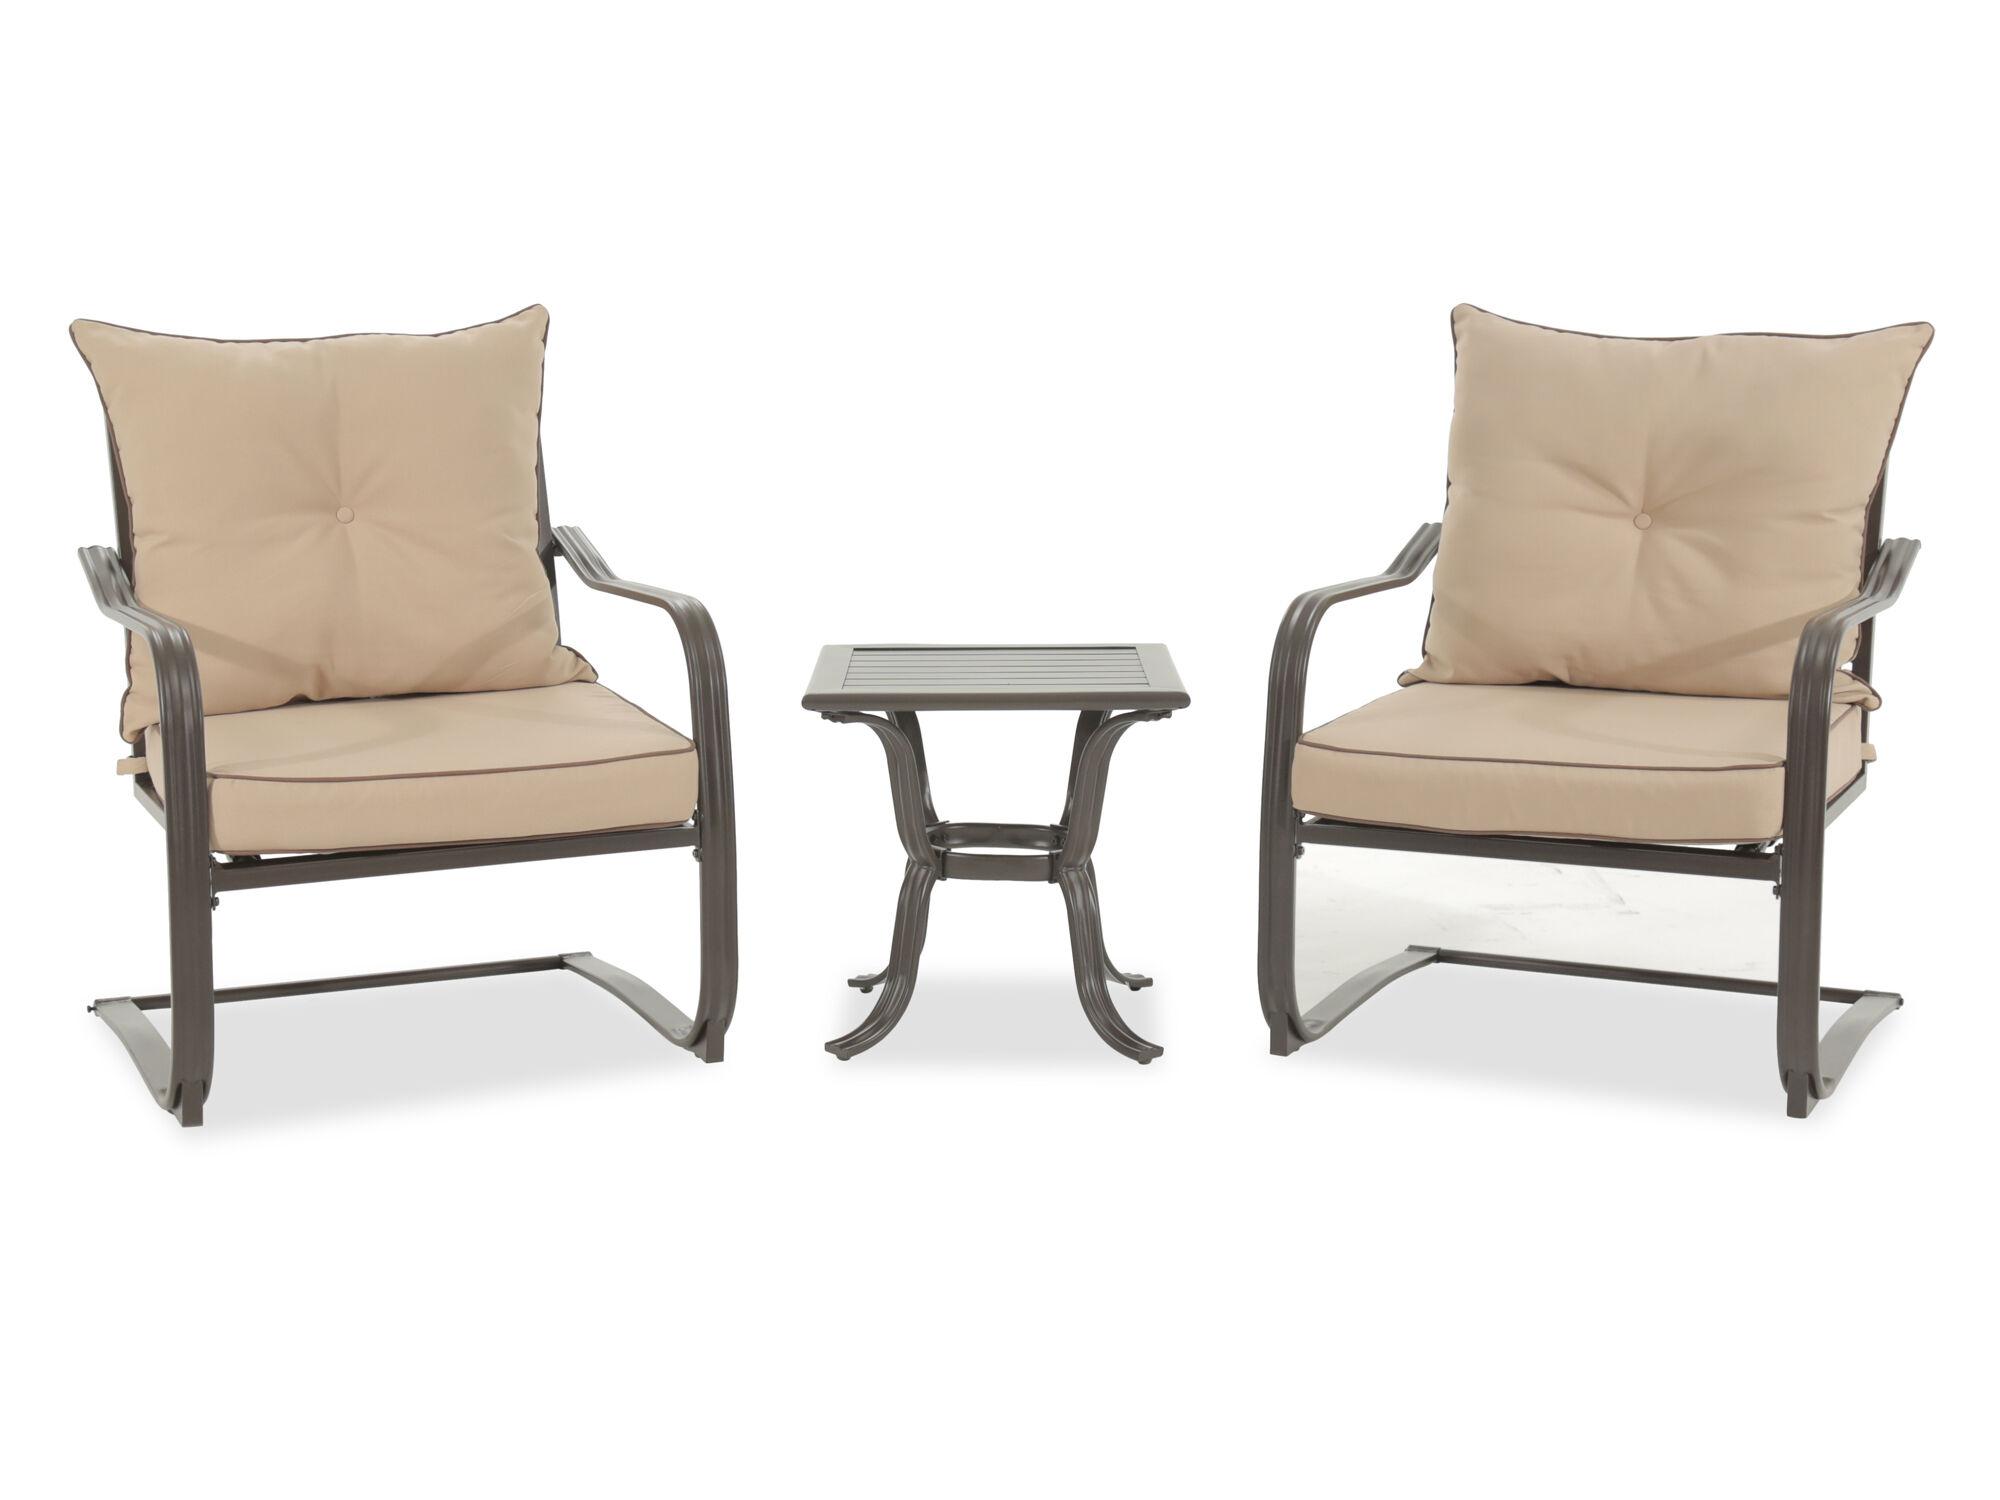 Outdoor furniture set Brown Threepiece Casual Upholstered Bistro Setnbspin Dark Mathis Brothers Patio Furniture Stores Mathis Brothers